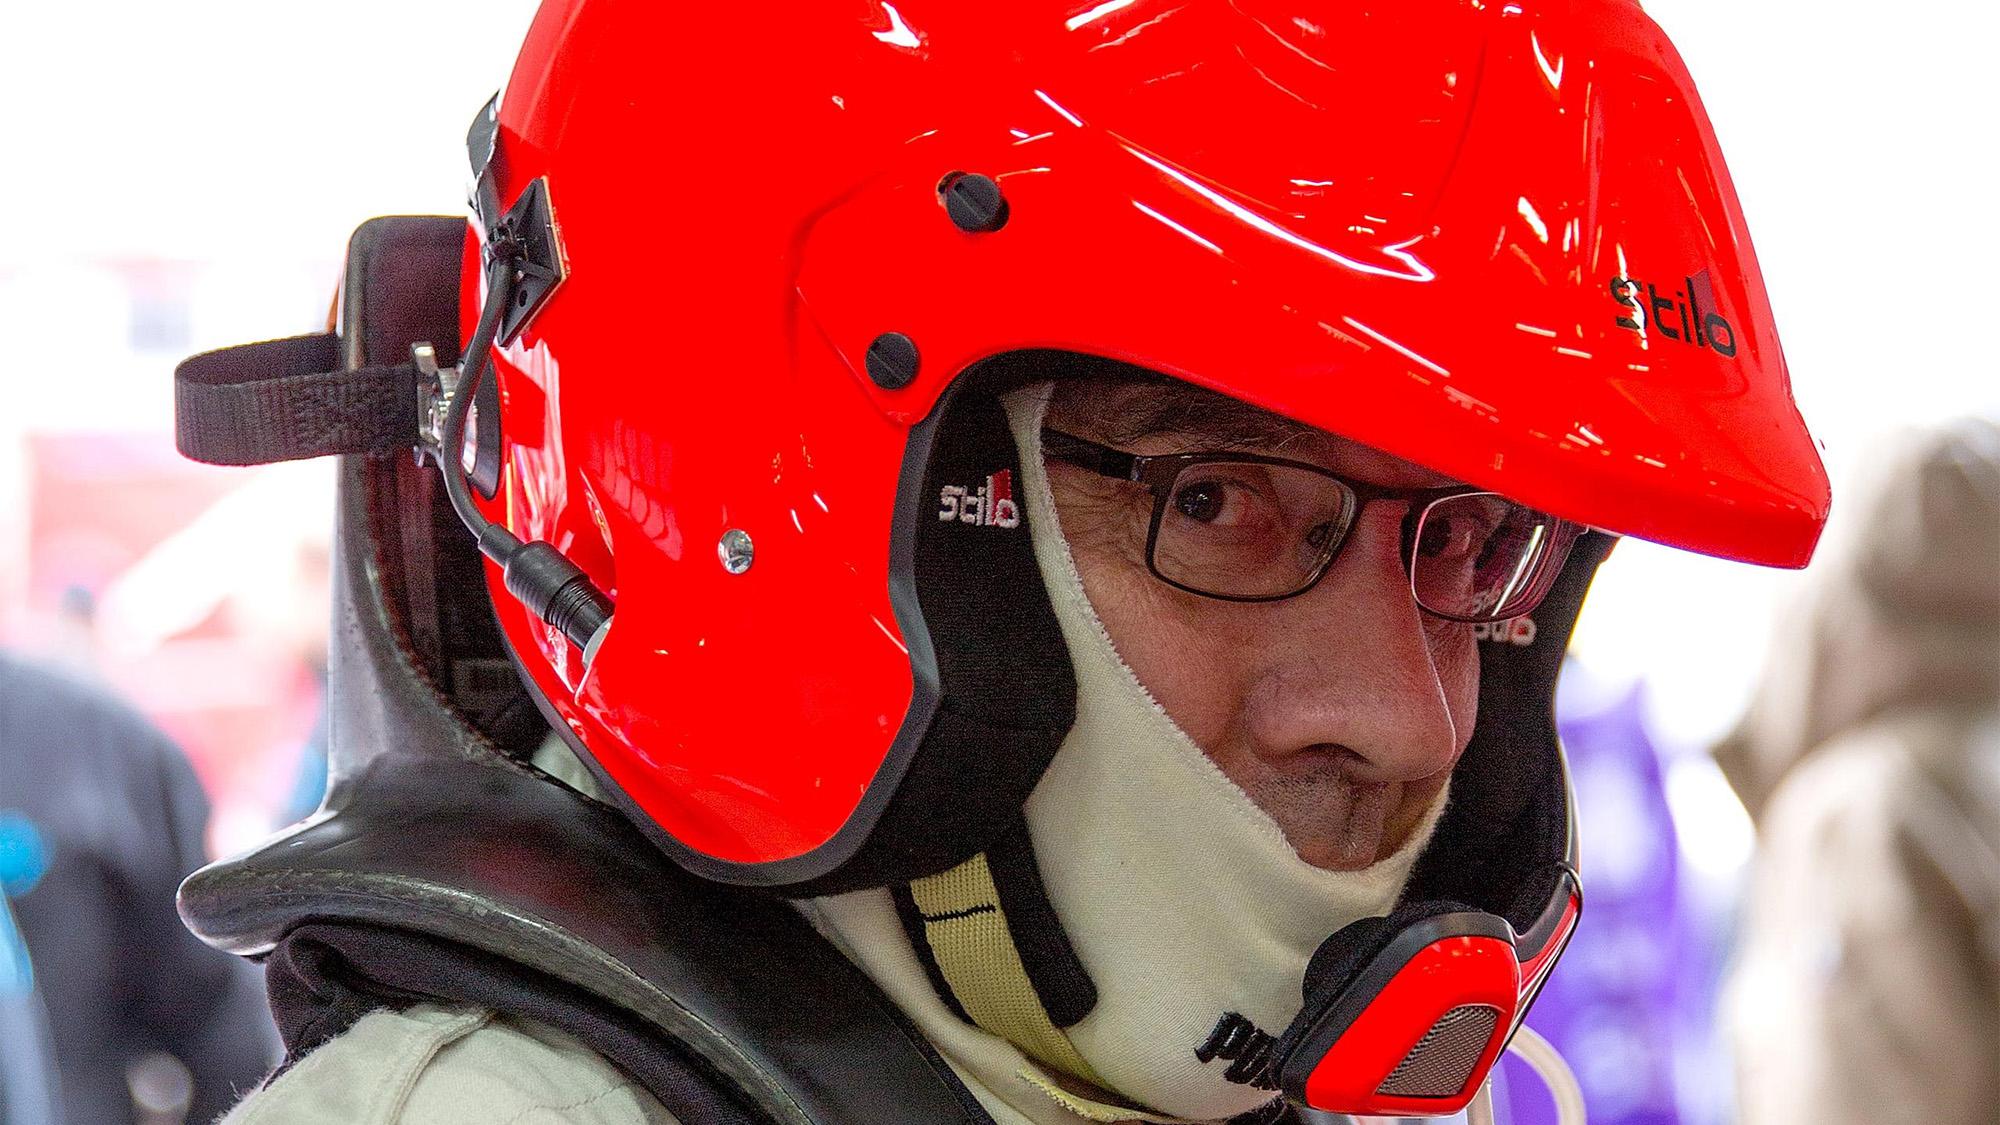 Dominique Bastien with helmet on